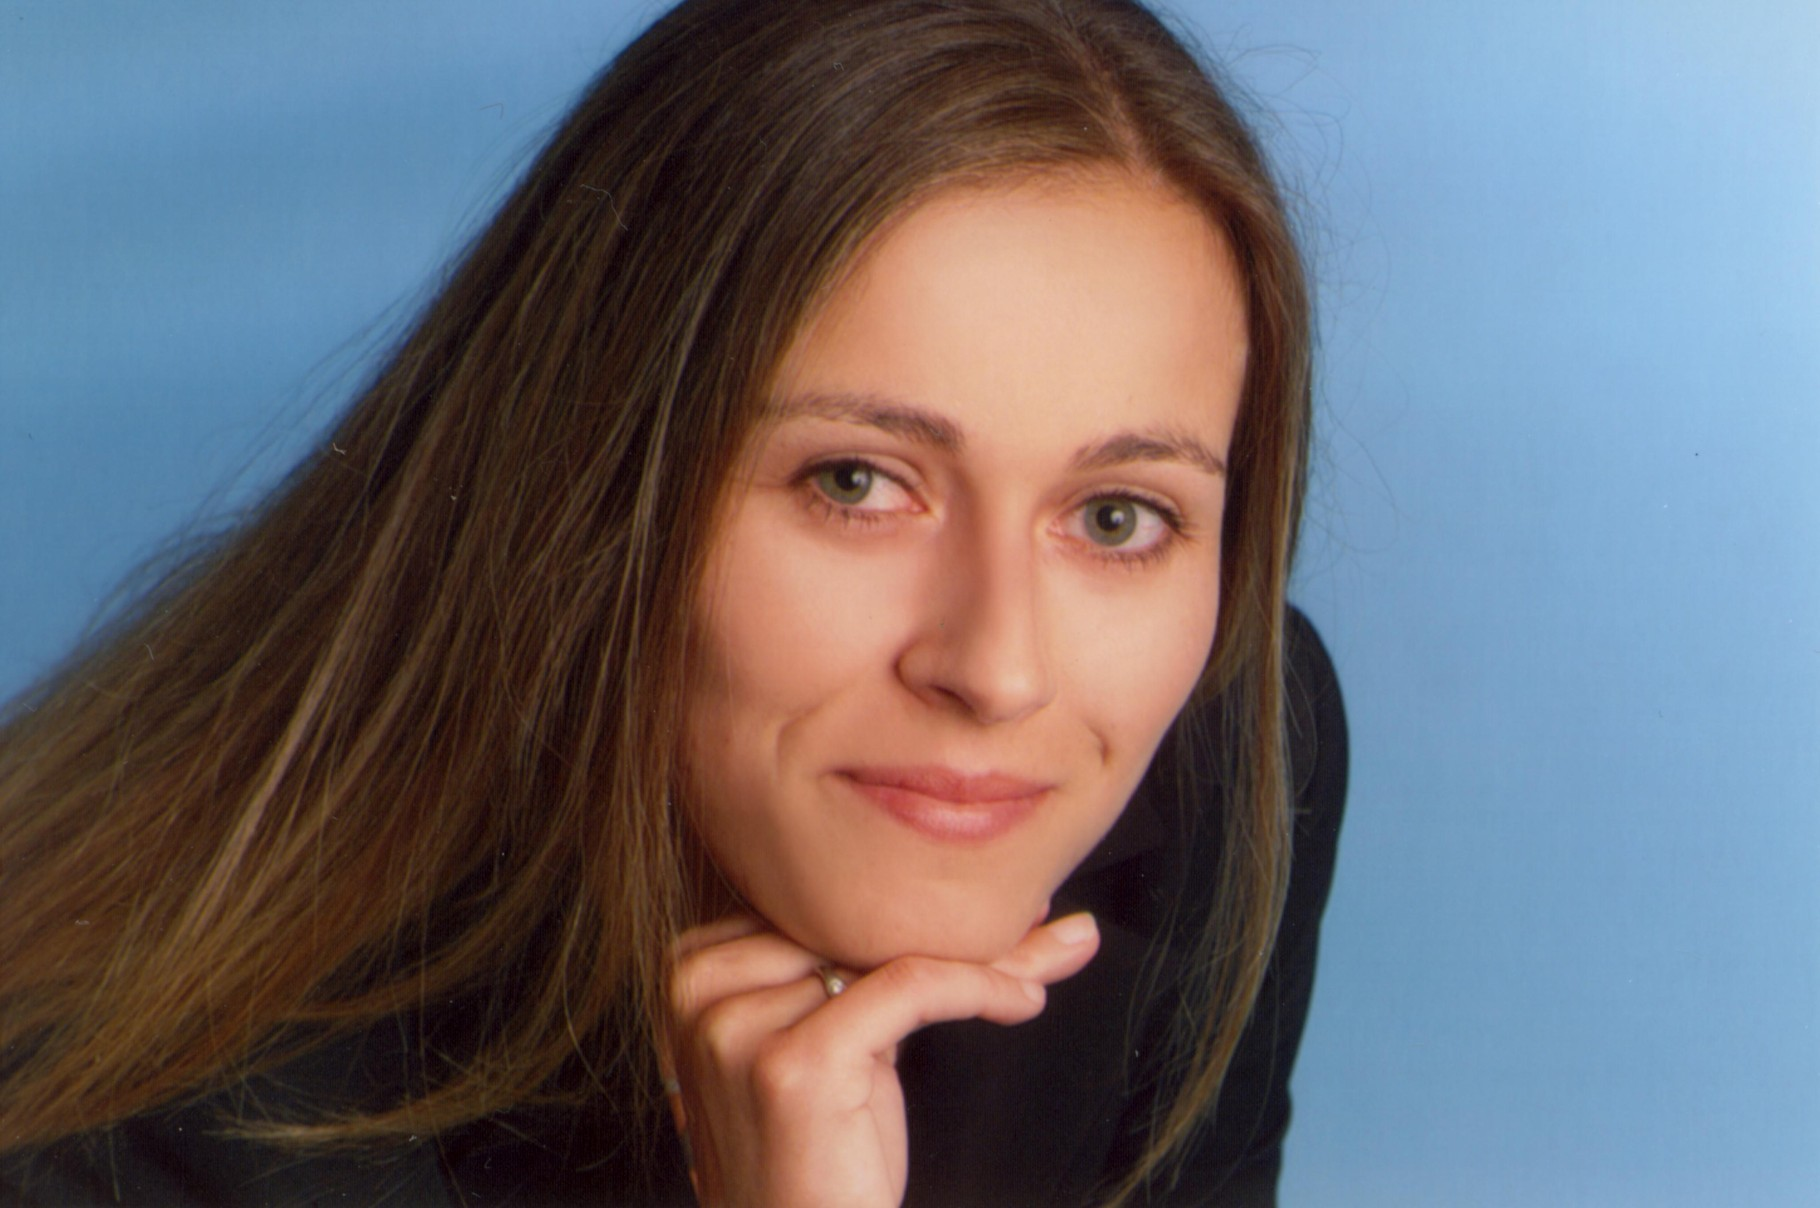 Mag. Silvia Hochschorner